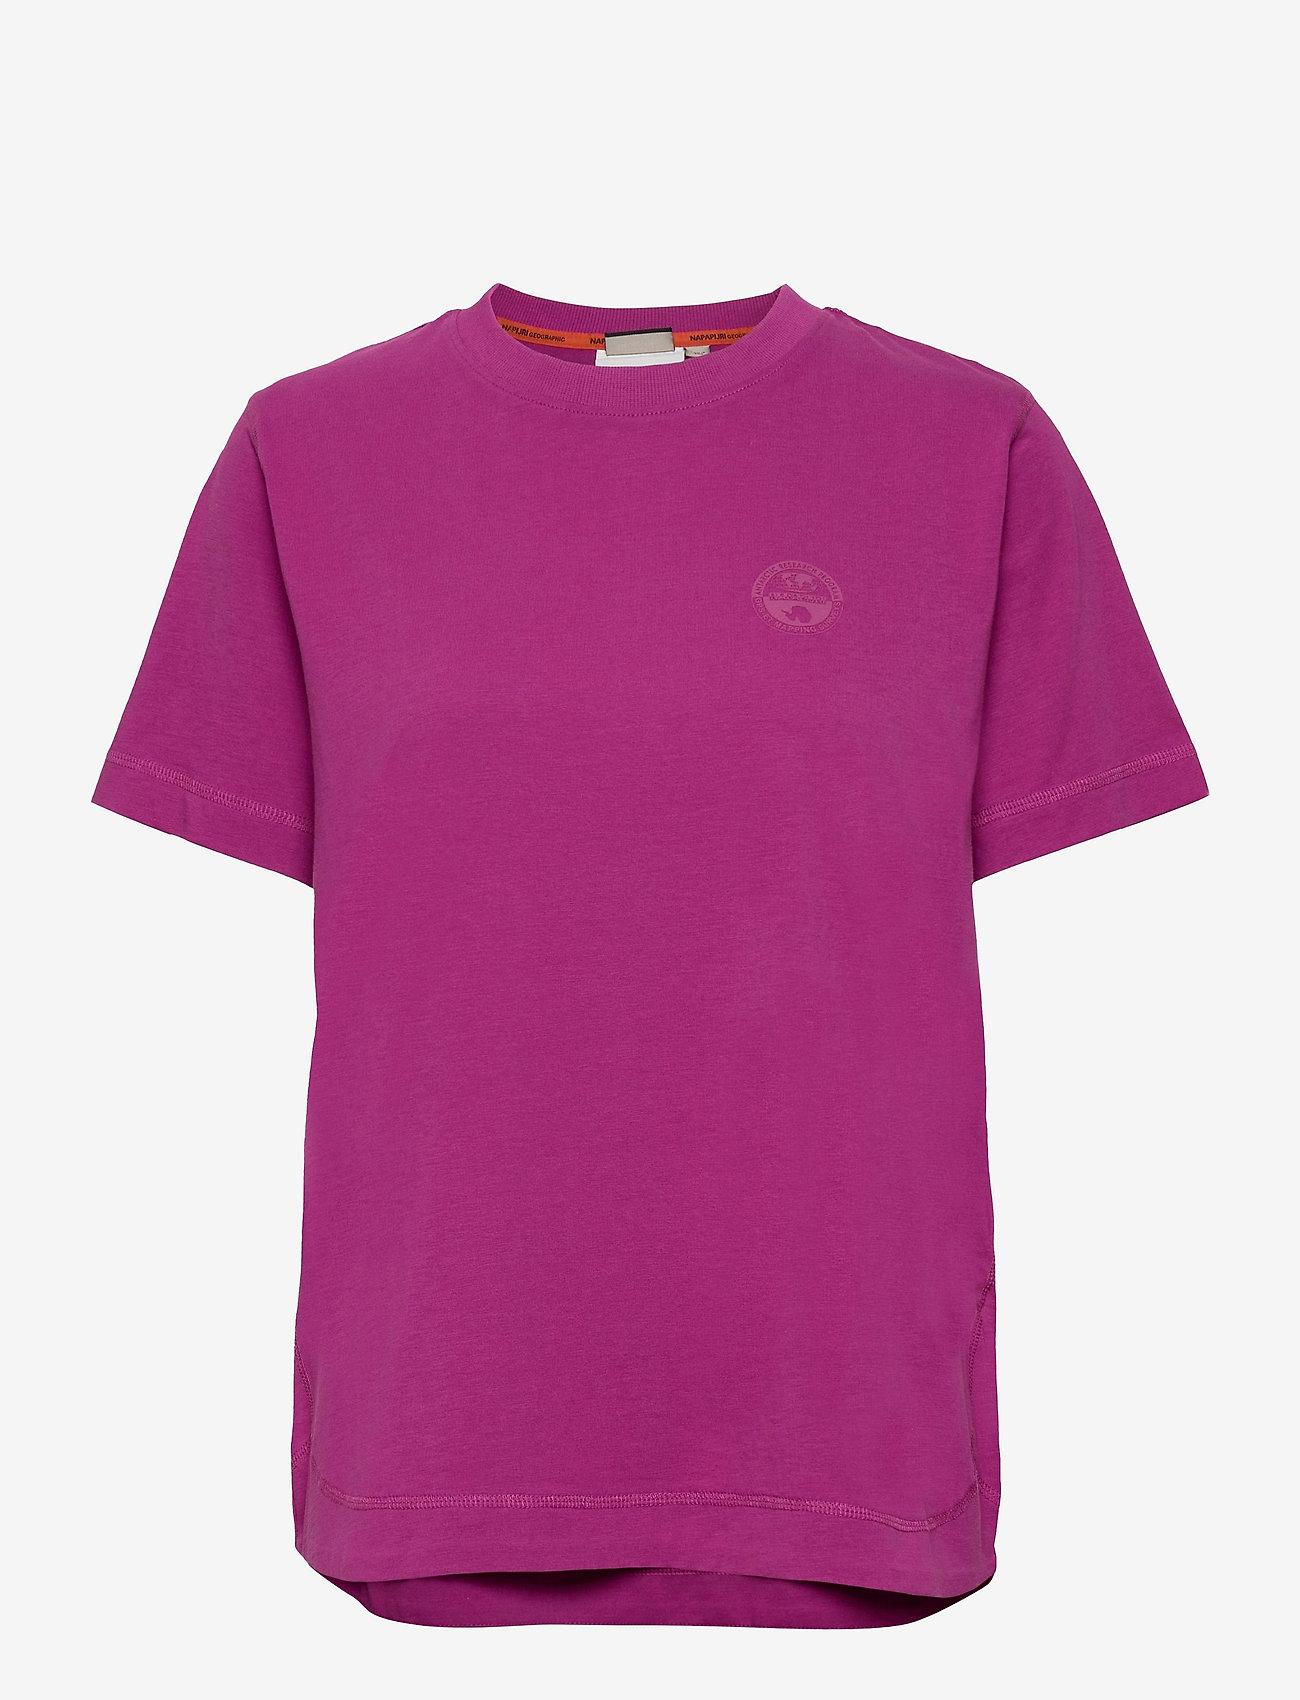 Napapijri - SILBE W - t-shirts - clover purple - 0